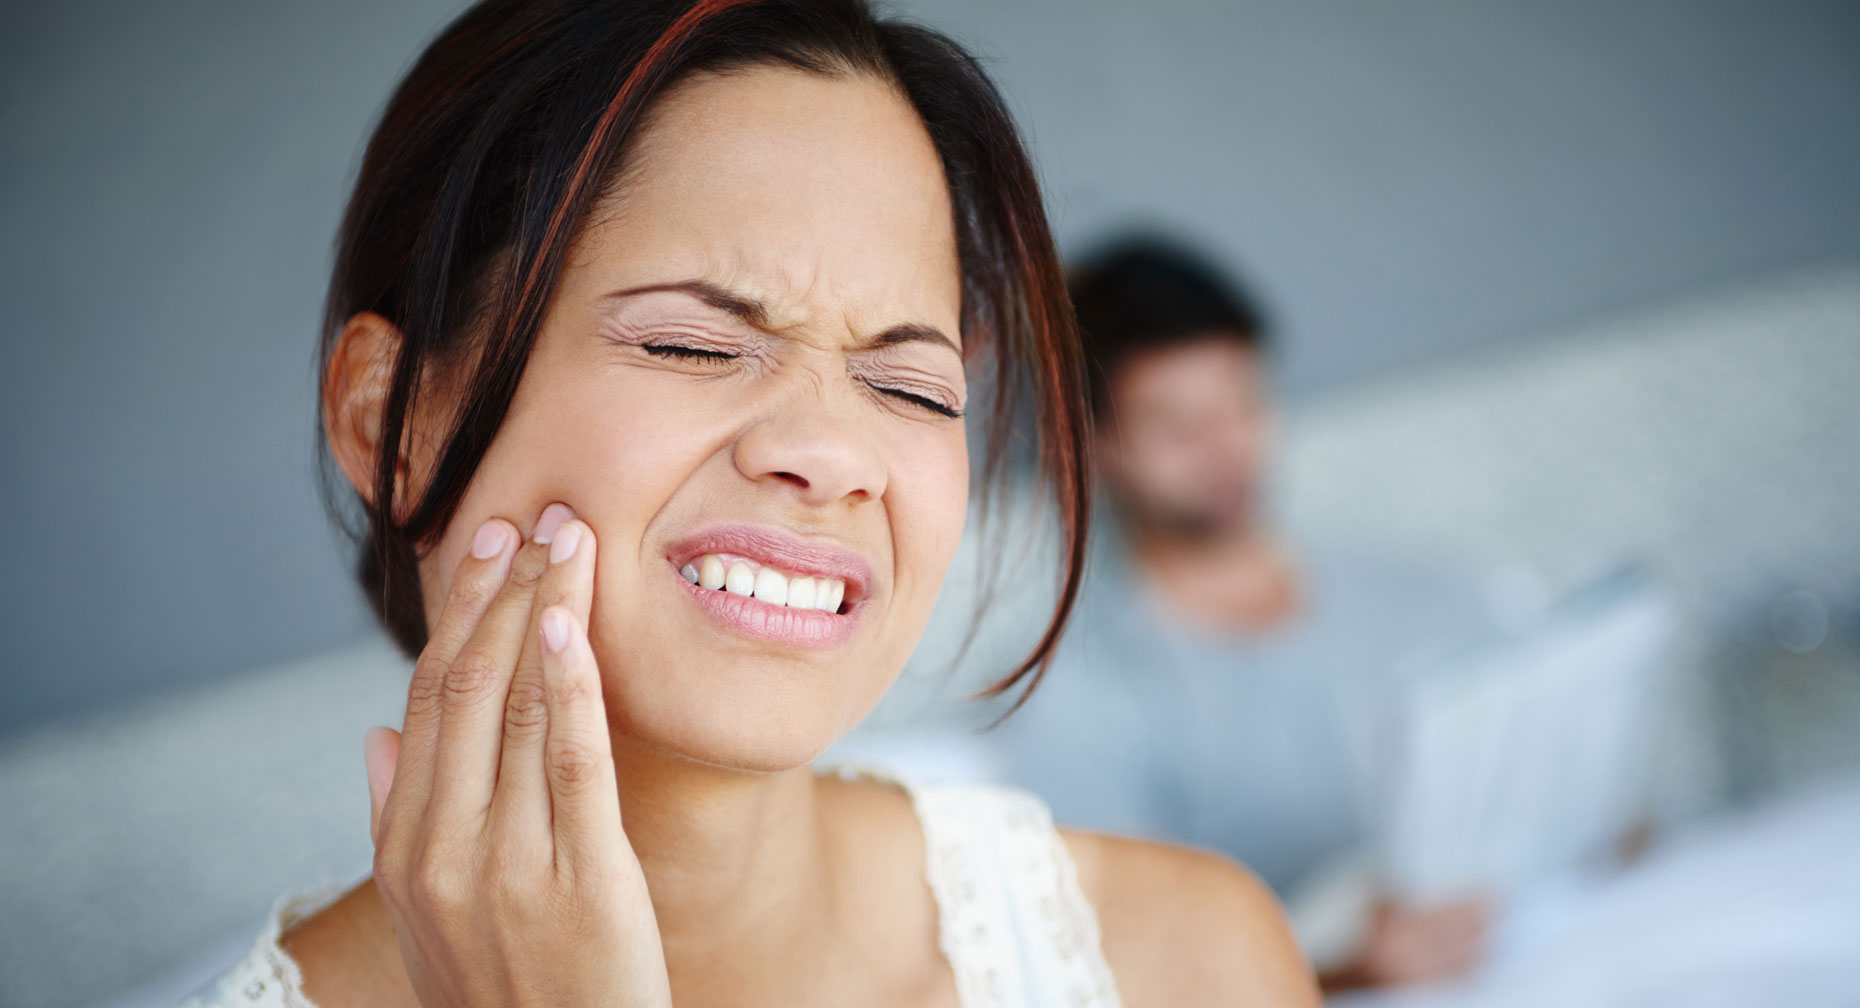 Facial cheek pain